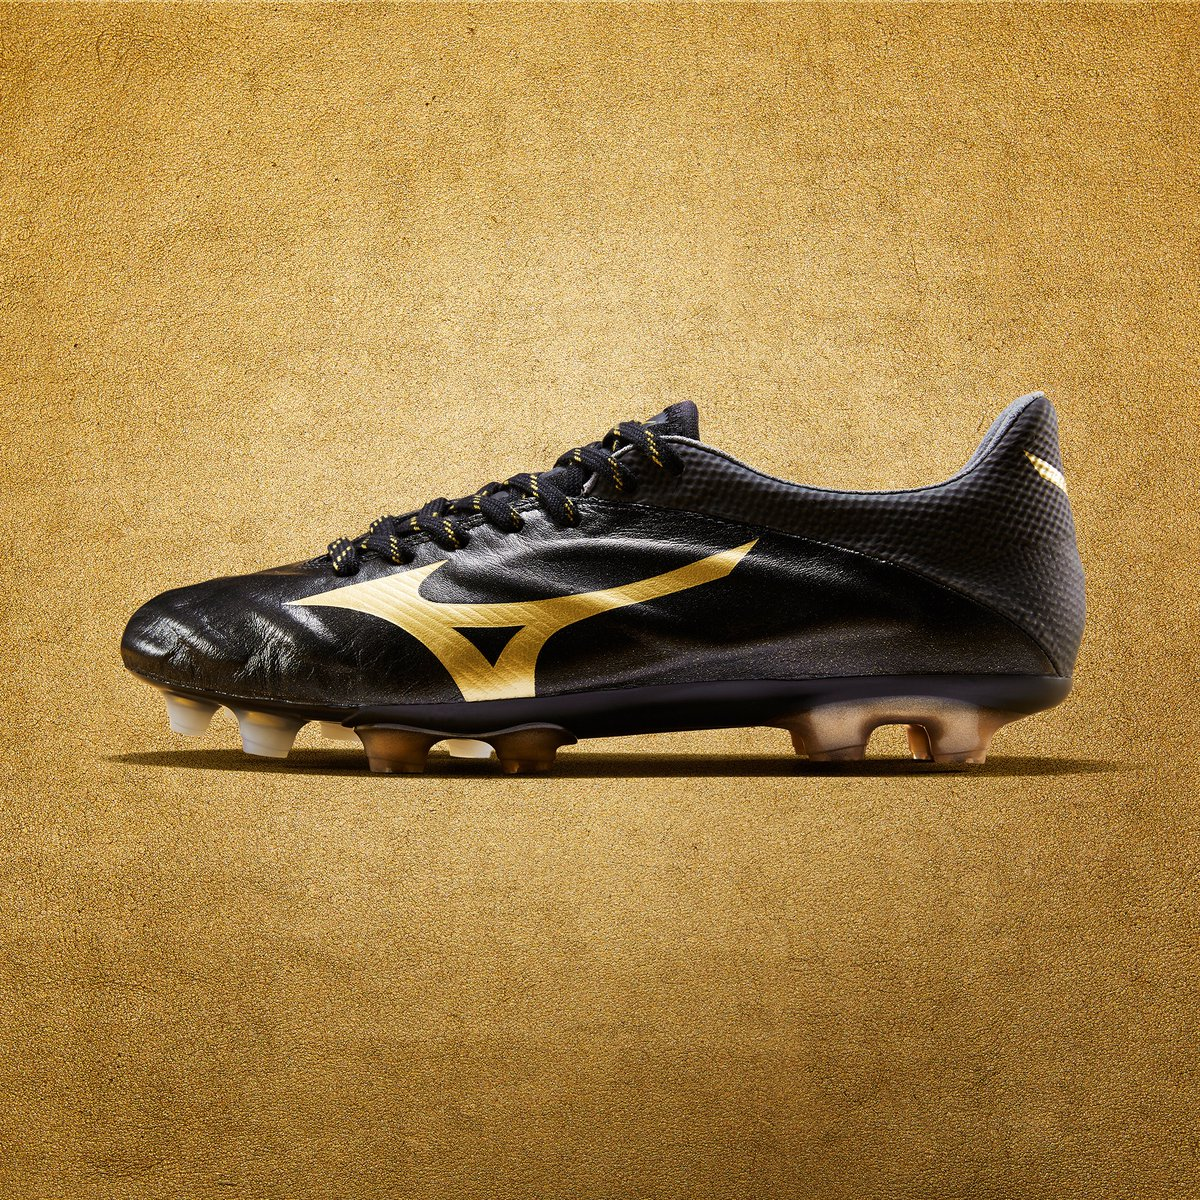 huge discount 46adc 39adf Stunning Gold / Black Mizuno Premium Boots Pack Released ...